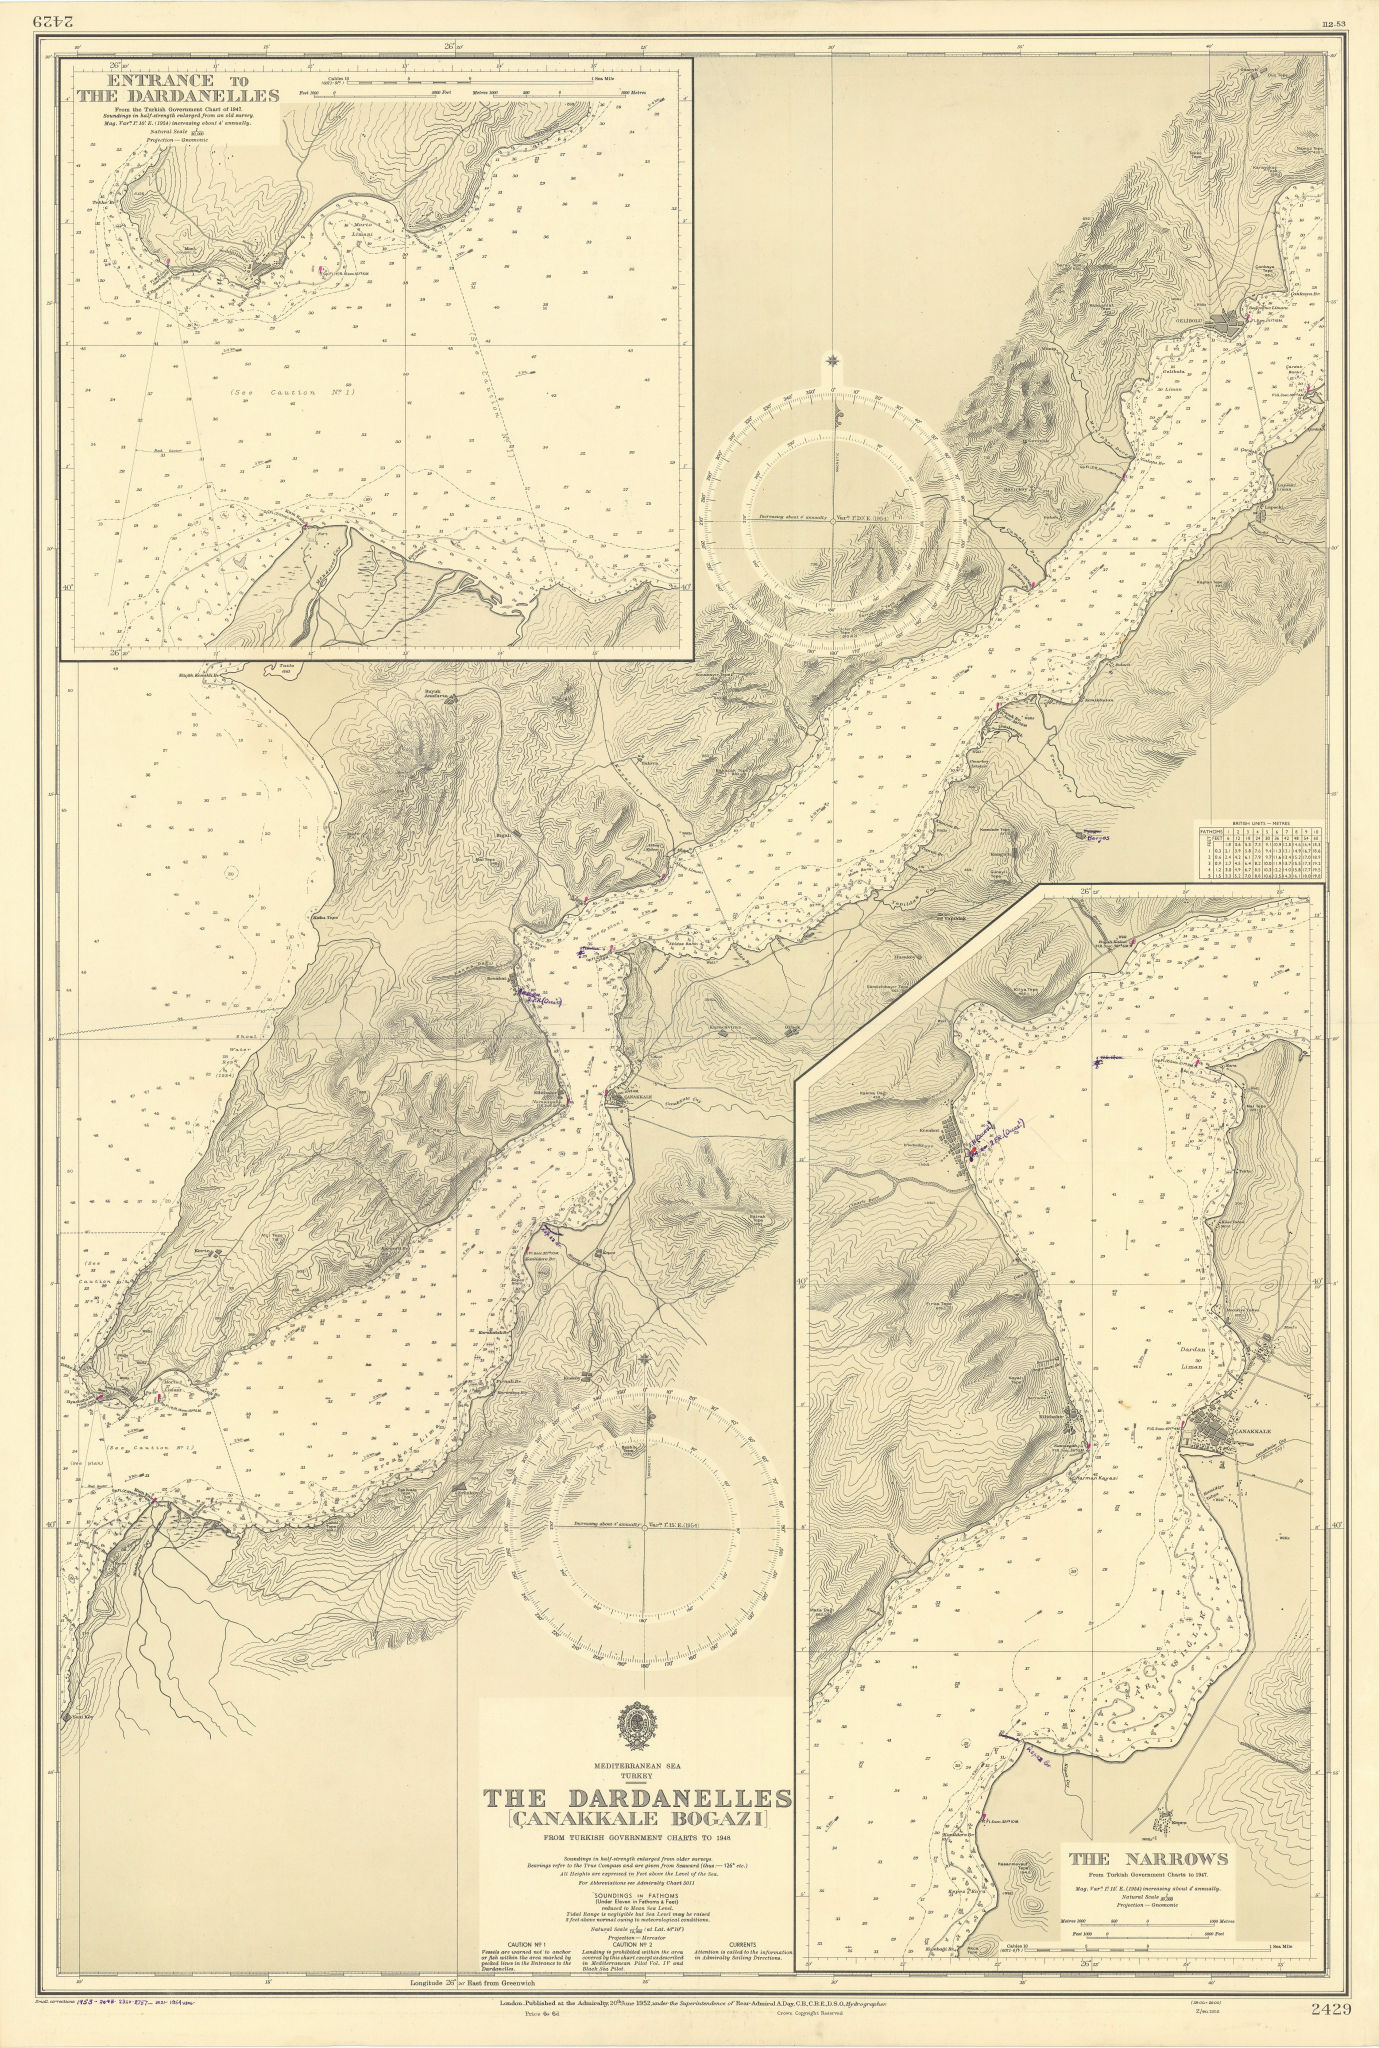 Dardanelles/Canakkale Bogazi. Narrows Turkey ADMIRALTY sea chart 1952 (1954) map